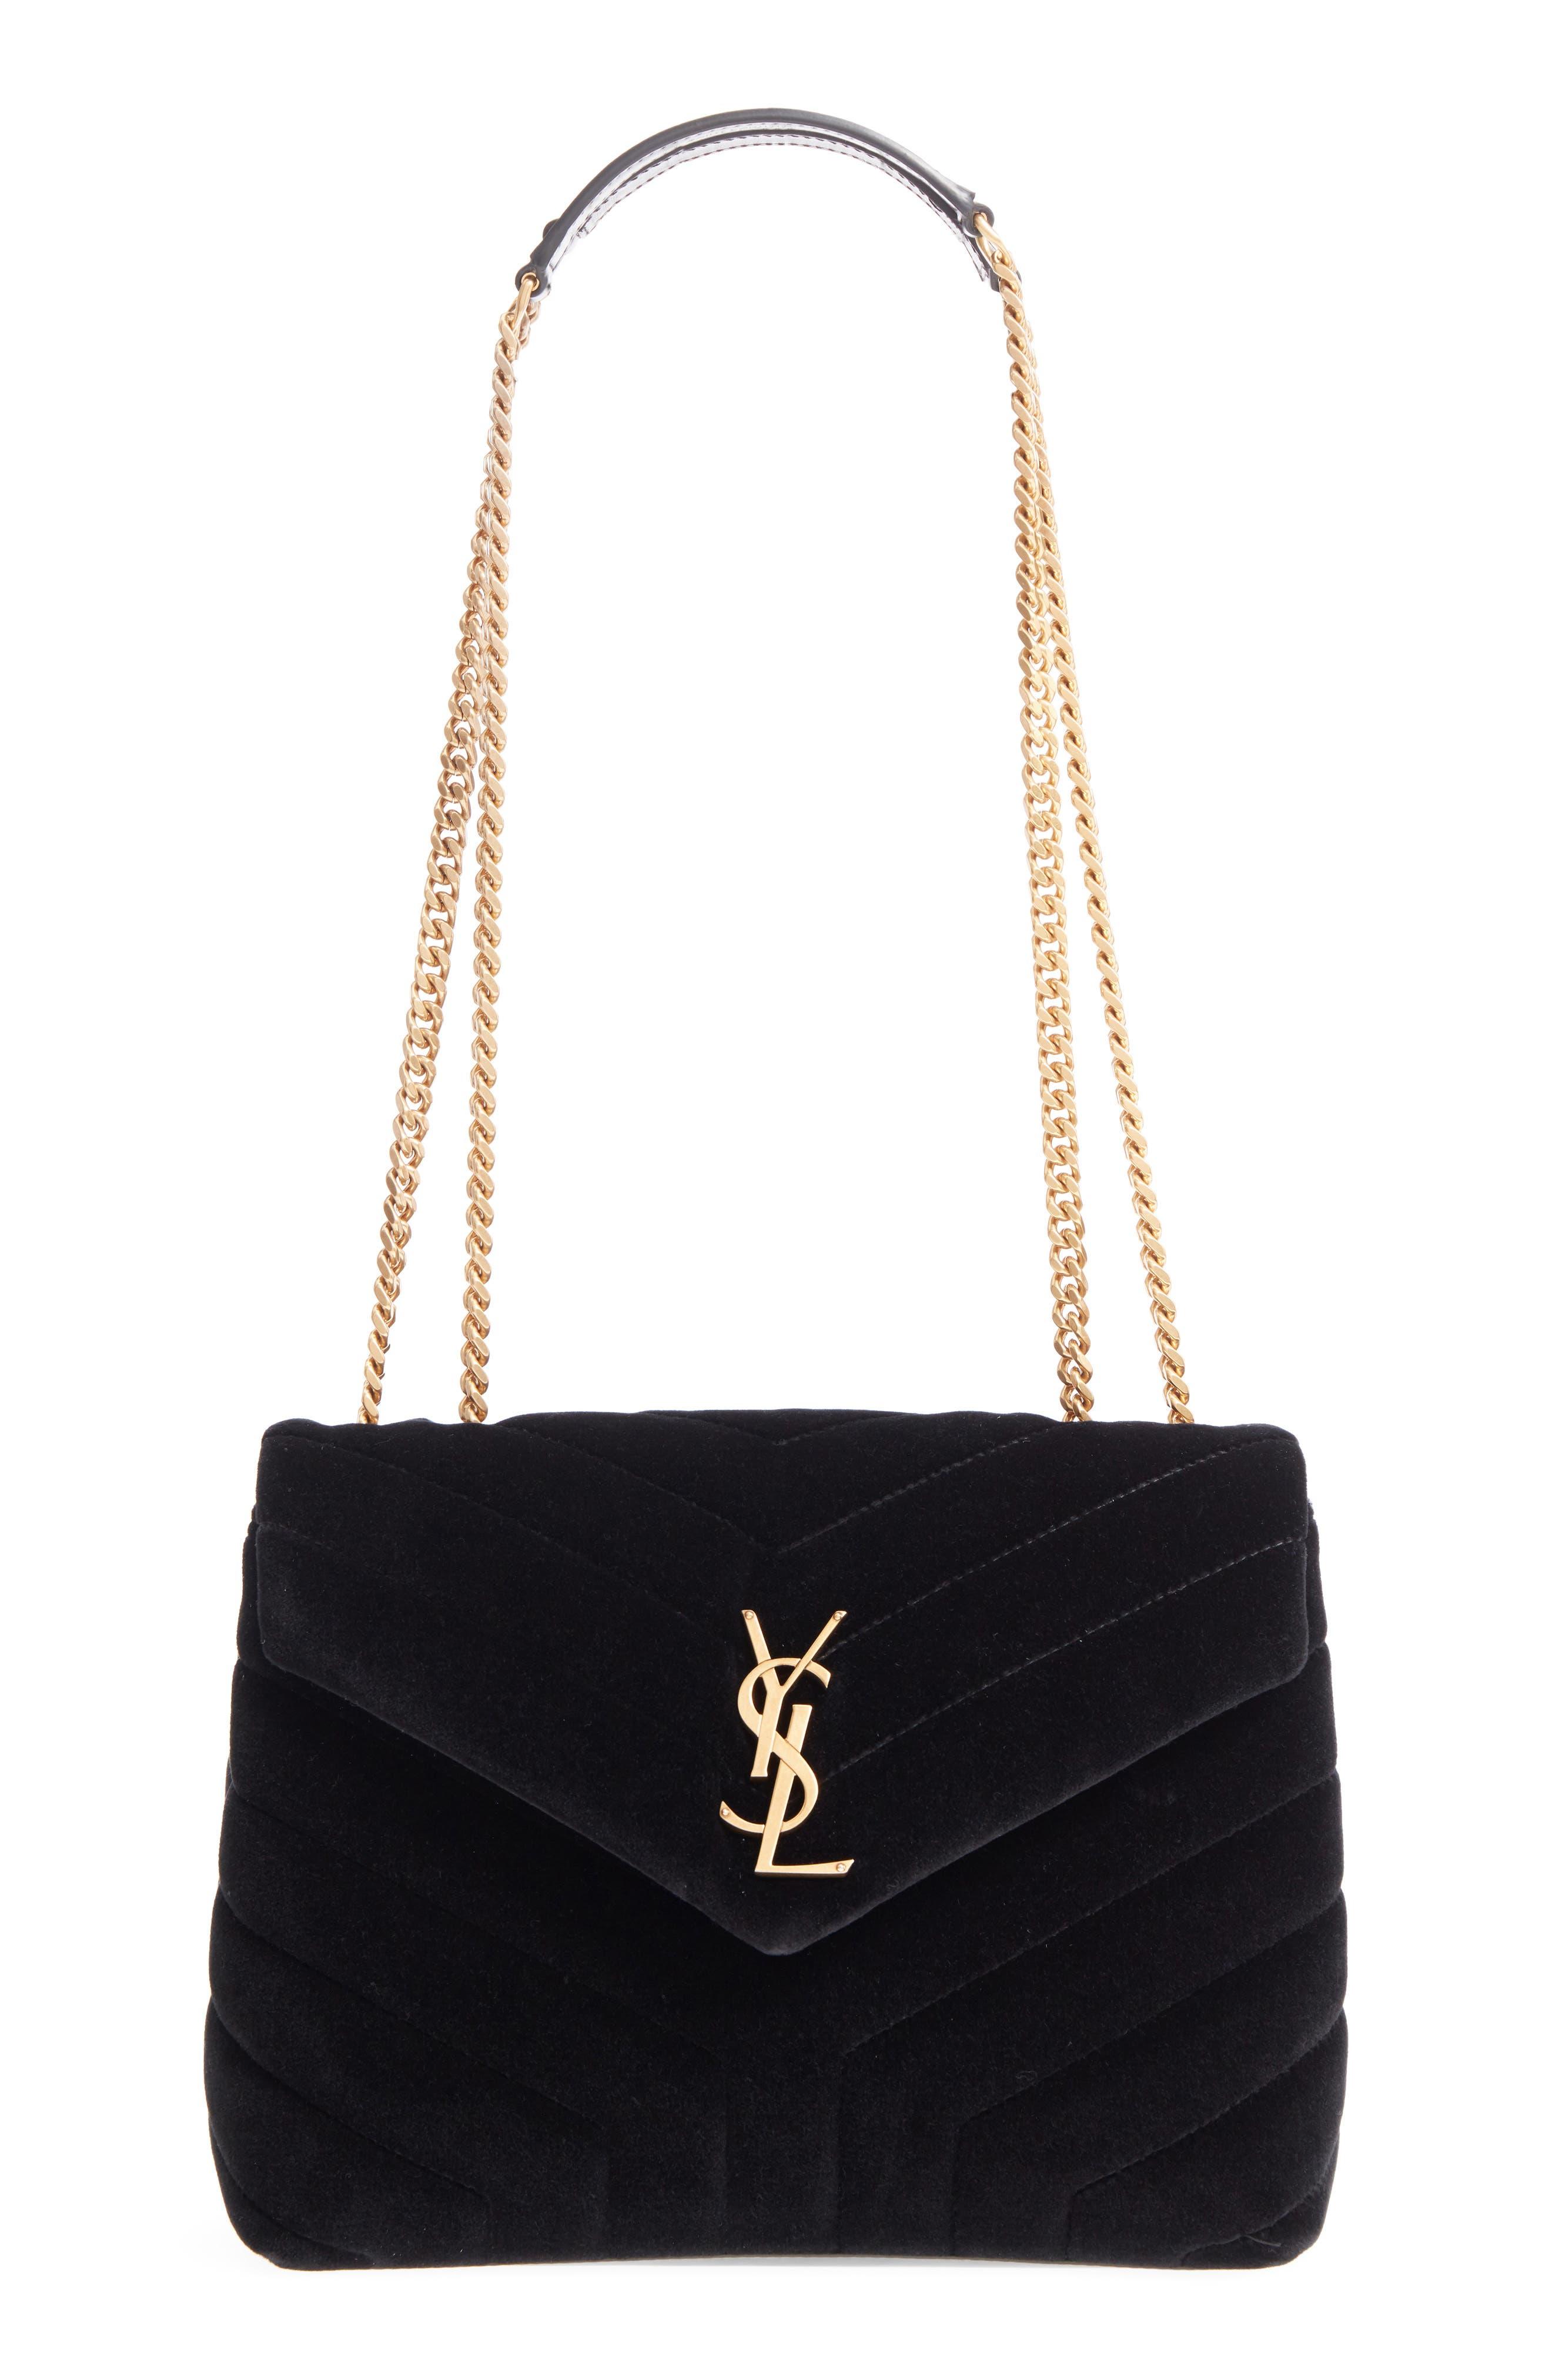 SAINT LAURENT,                             Small Loulou Velvet Shoulder Bag,                             Main thumbnail 1, color,                             NERO/ NERO/ NERO